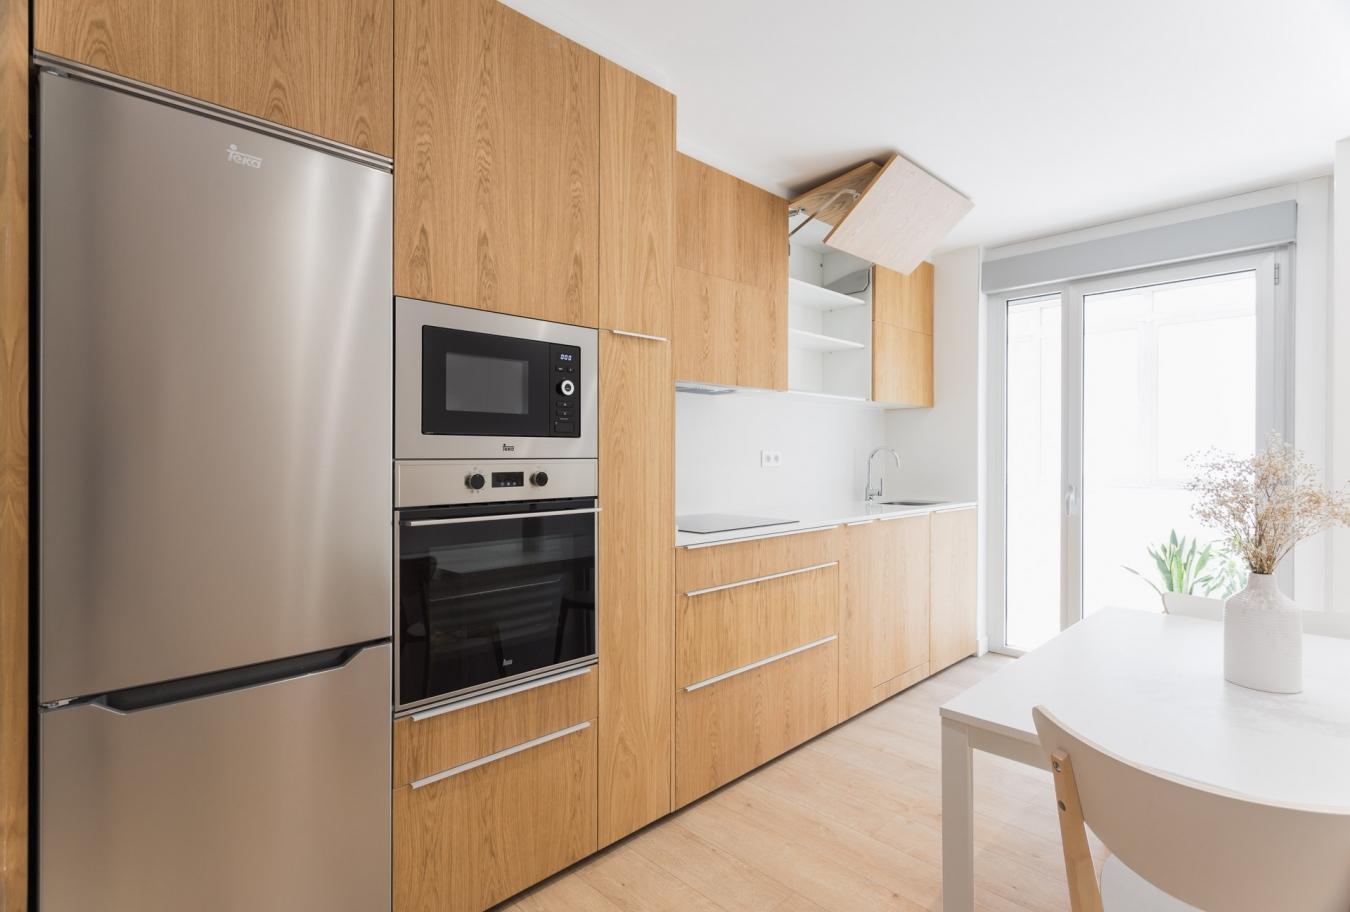 Reforma integral de vivienda   Encaixe Arquitectura - Reforma integral de vivienda   Encaixe Arquitectura - Reforma integral de vivienda   Encaixe Arquitectura   Jose Chas